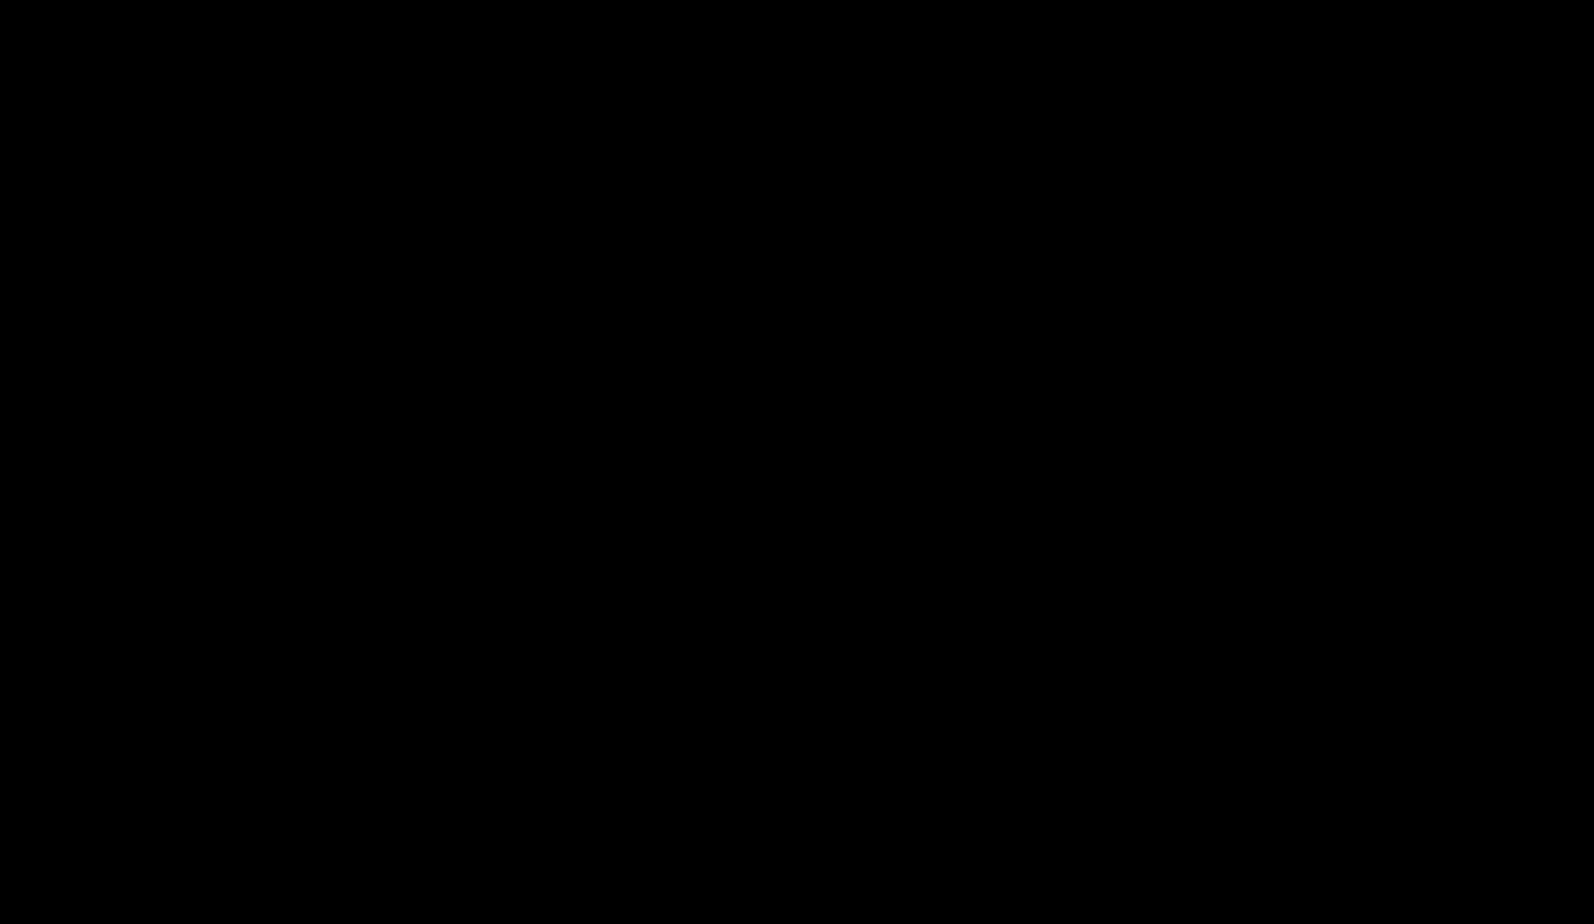 Dansyl-d<sub>6</sub> cadaverine